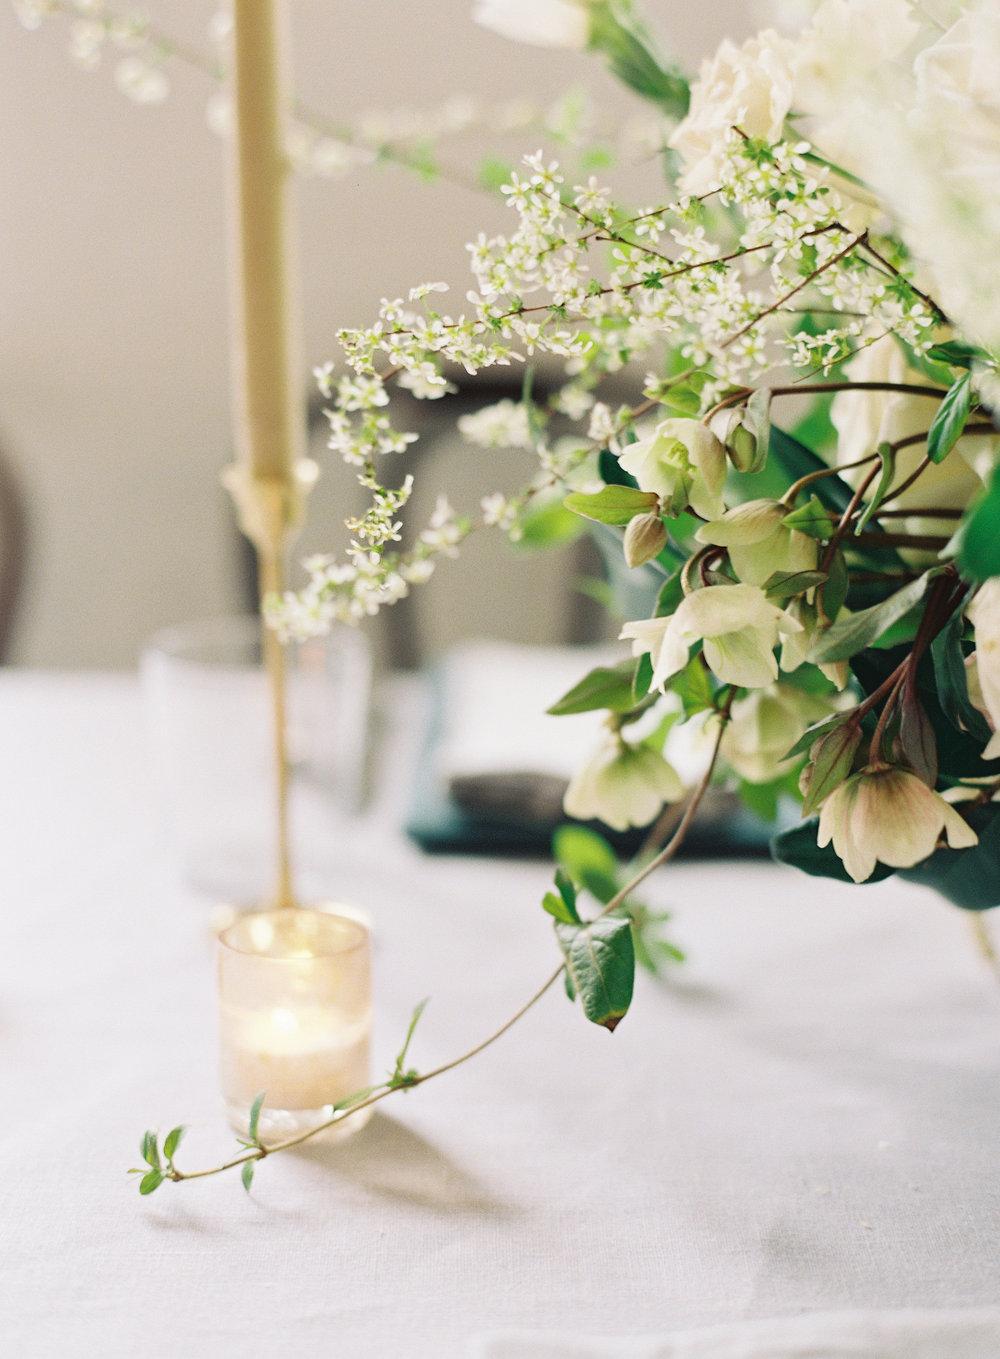 All Floral Images-0241.jpg